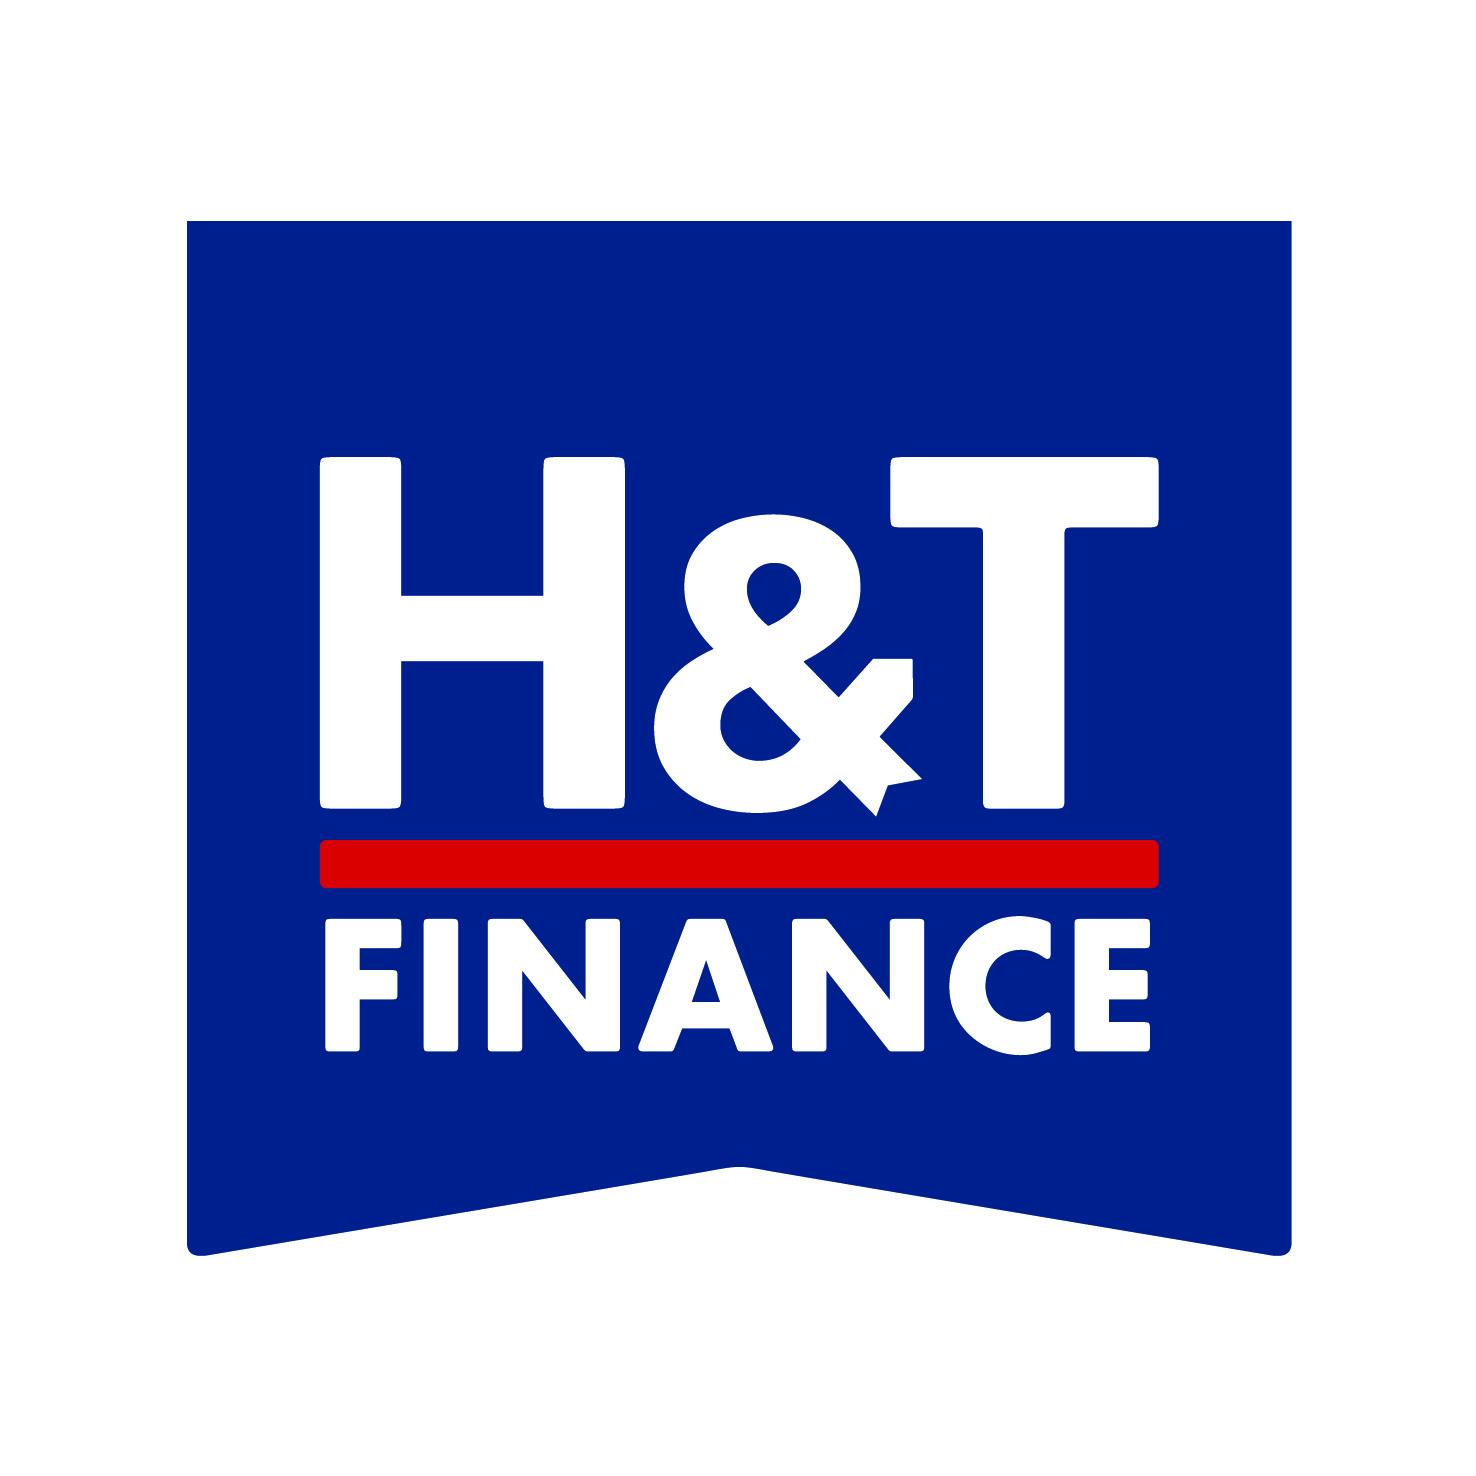 H&T_Finance_2019.jpg